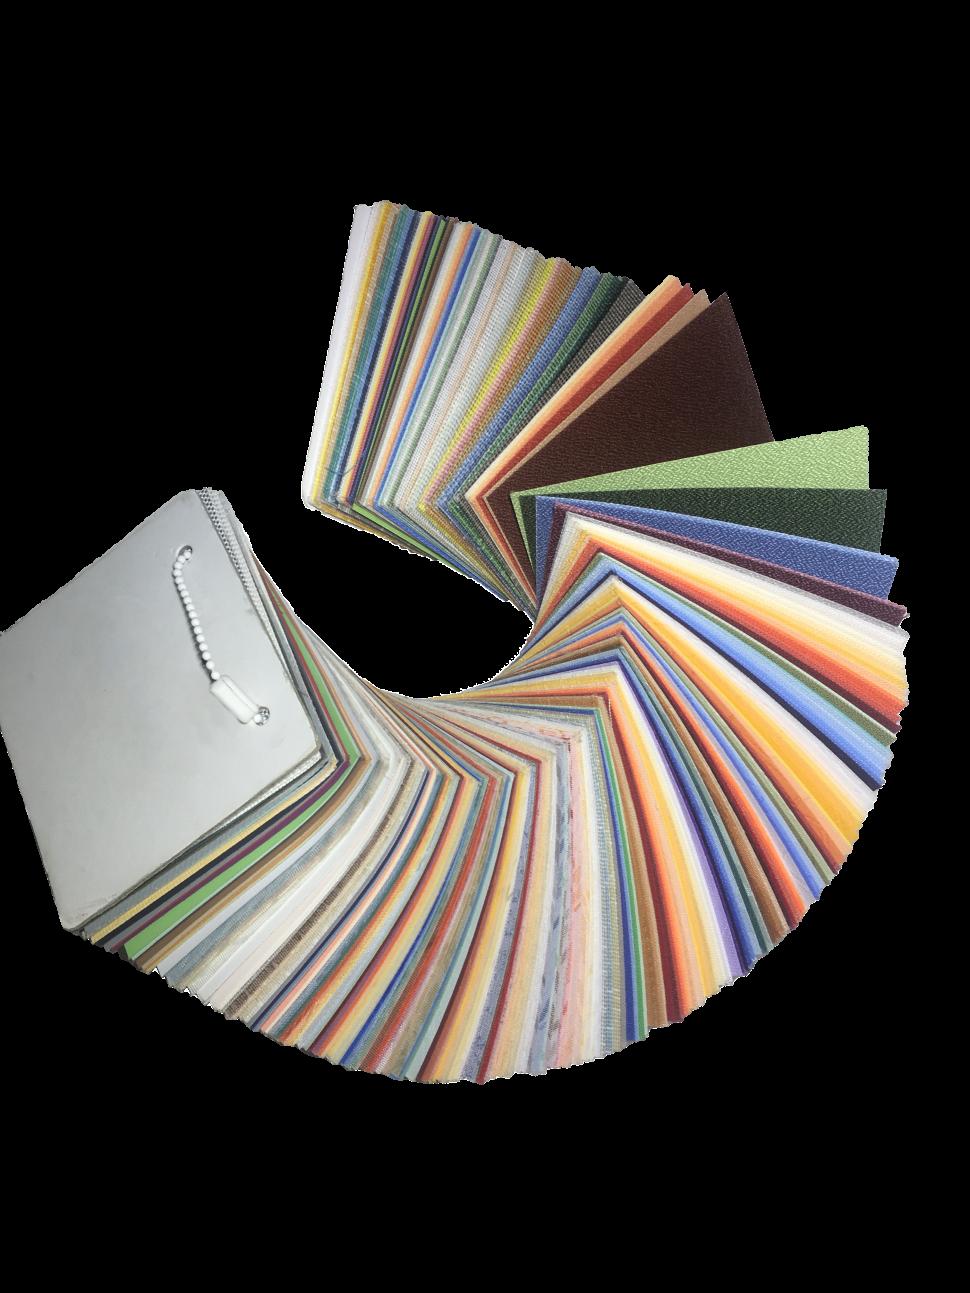 Vzorka-vertikalne-zaluzie-latky-farebne